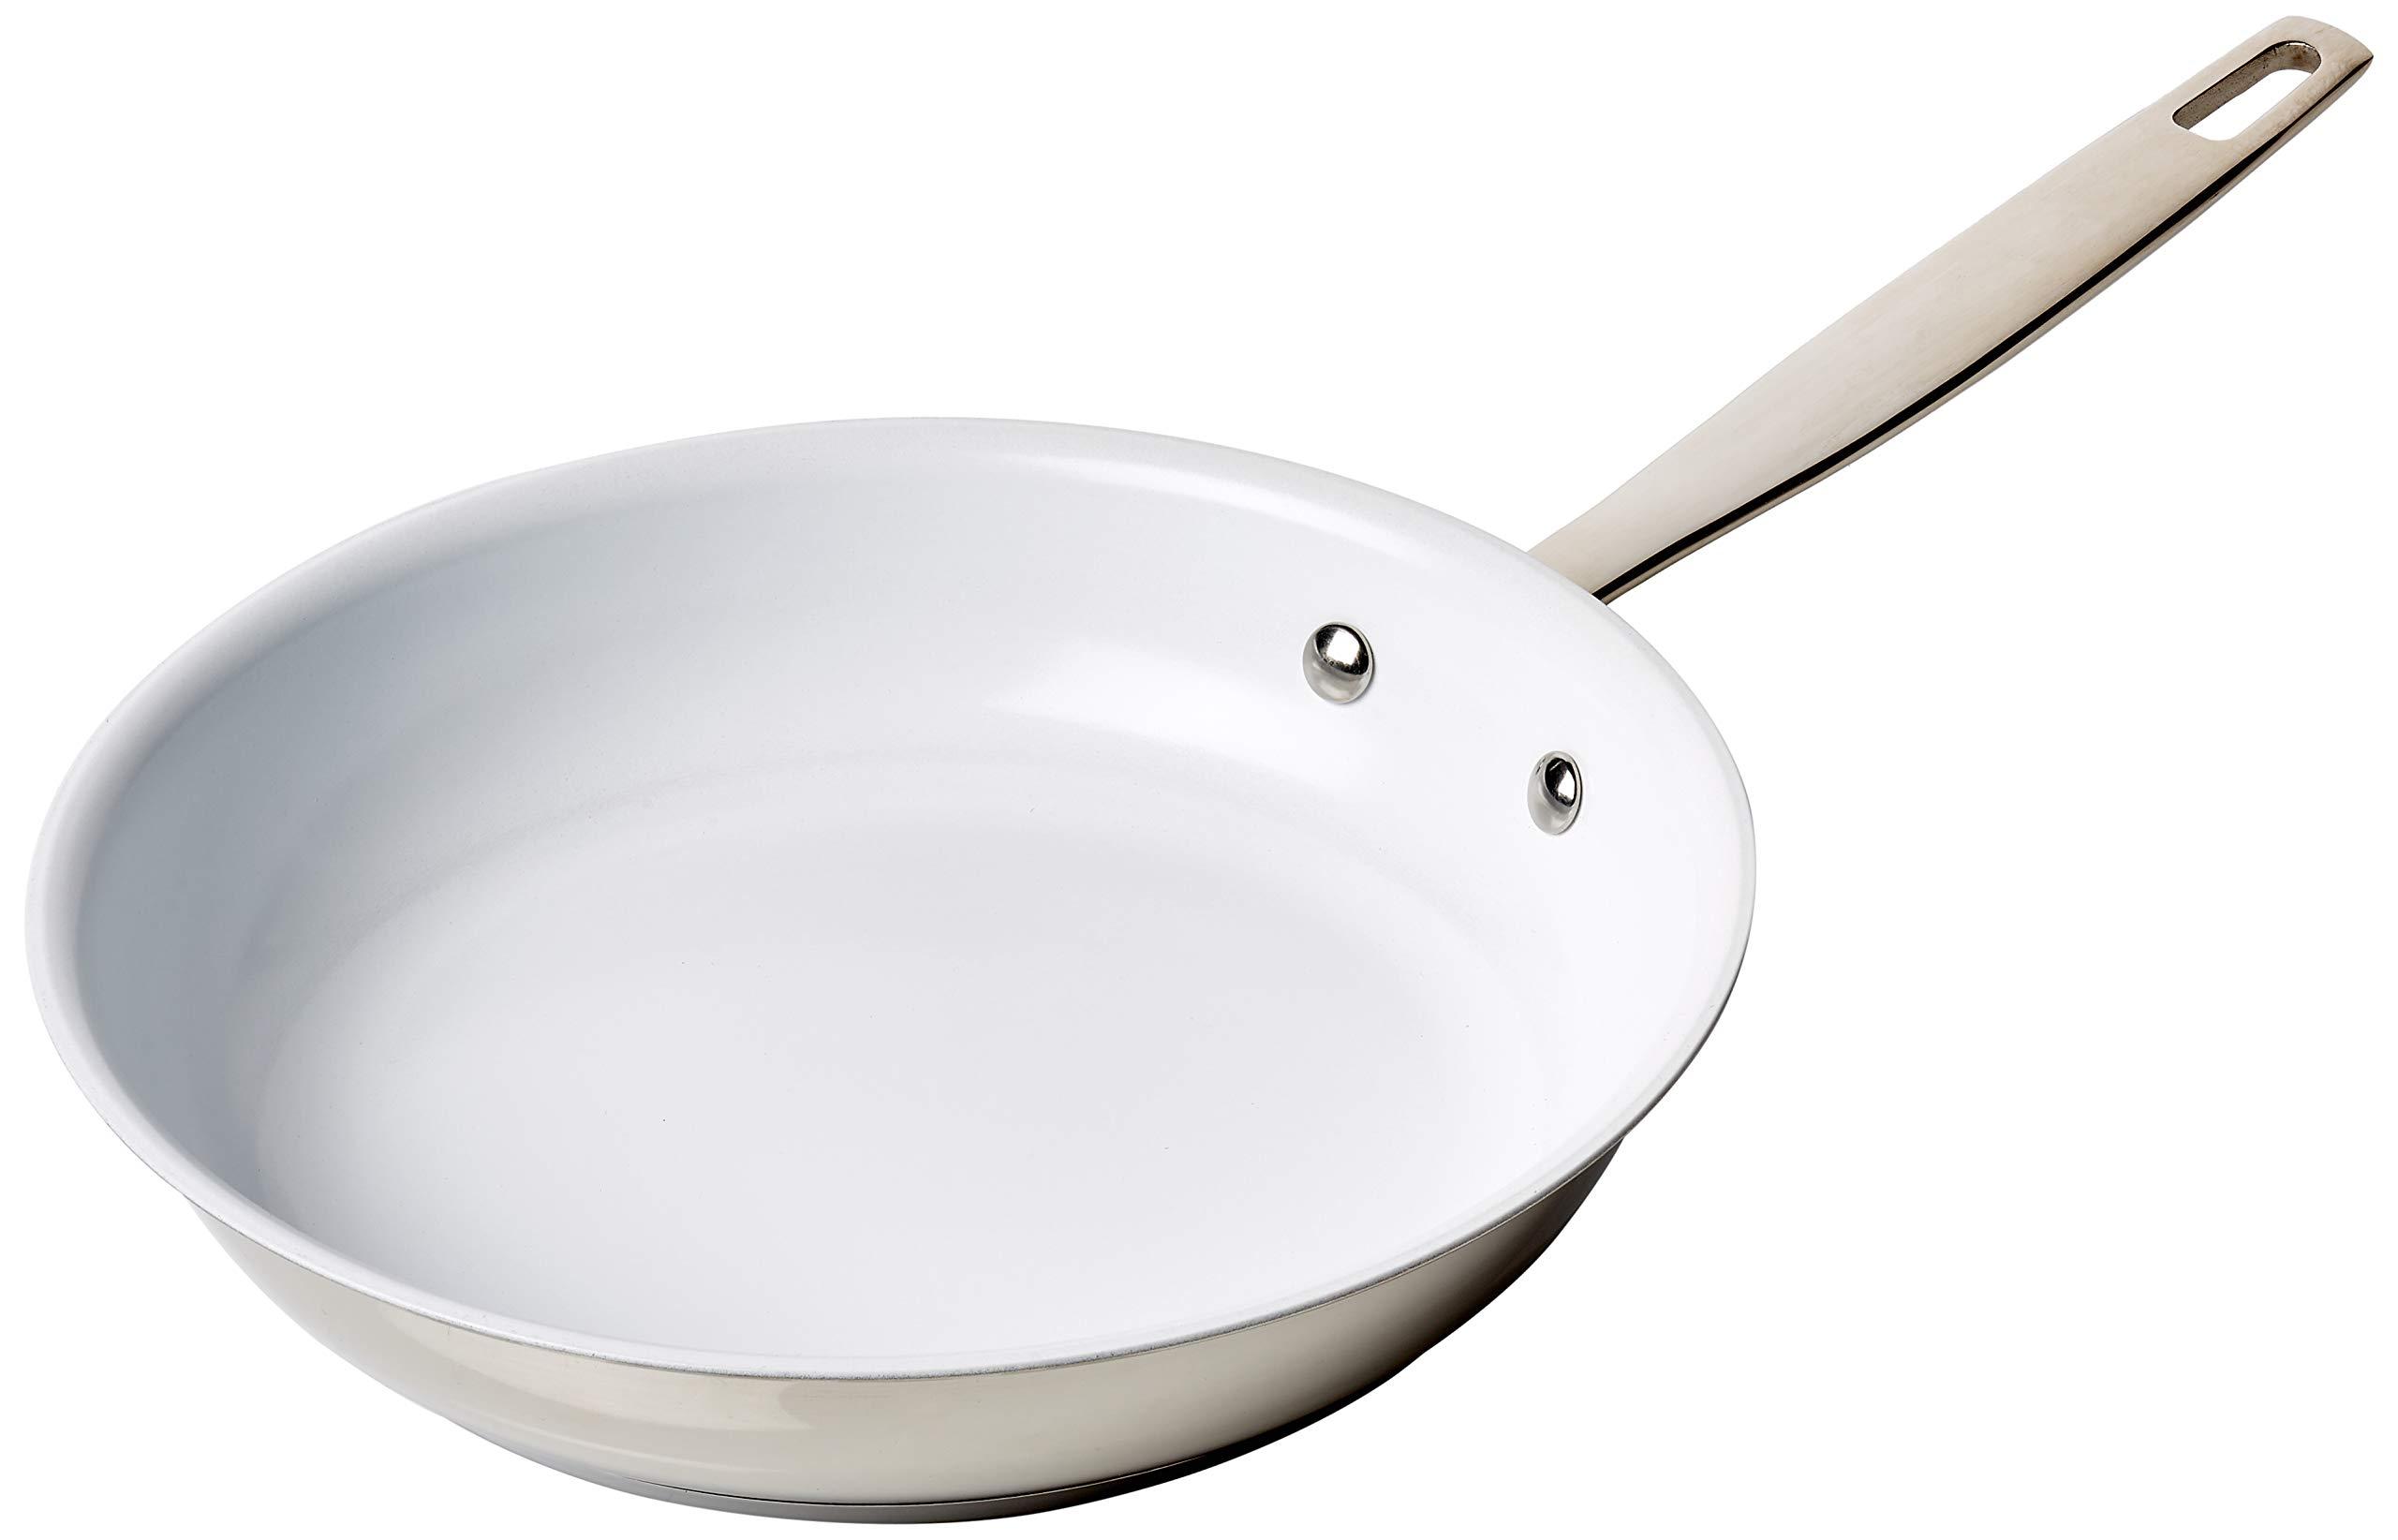 Giannini 5822 Labond Frying-Pan, Multicolor